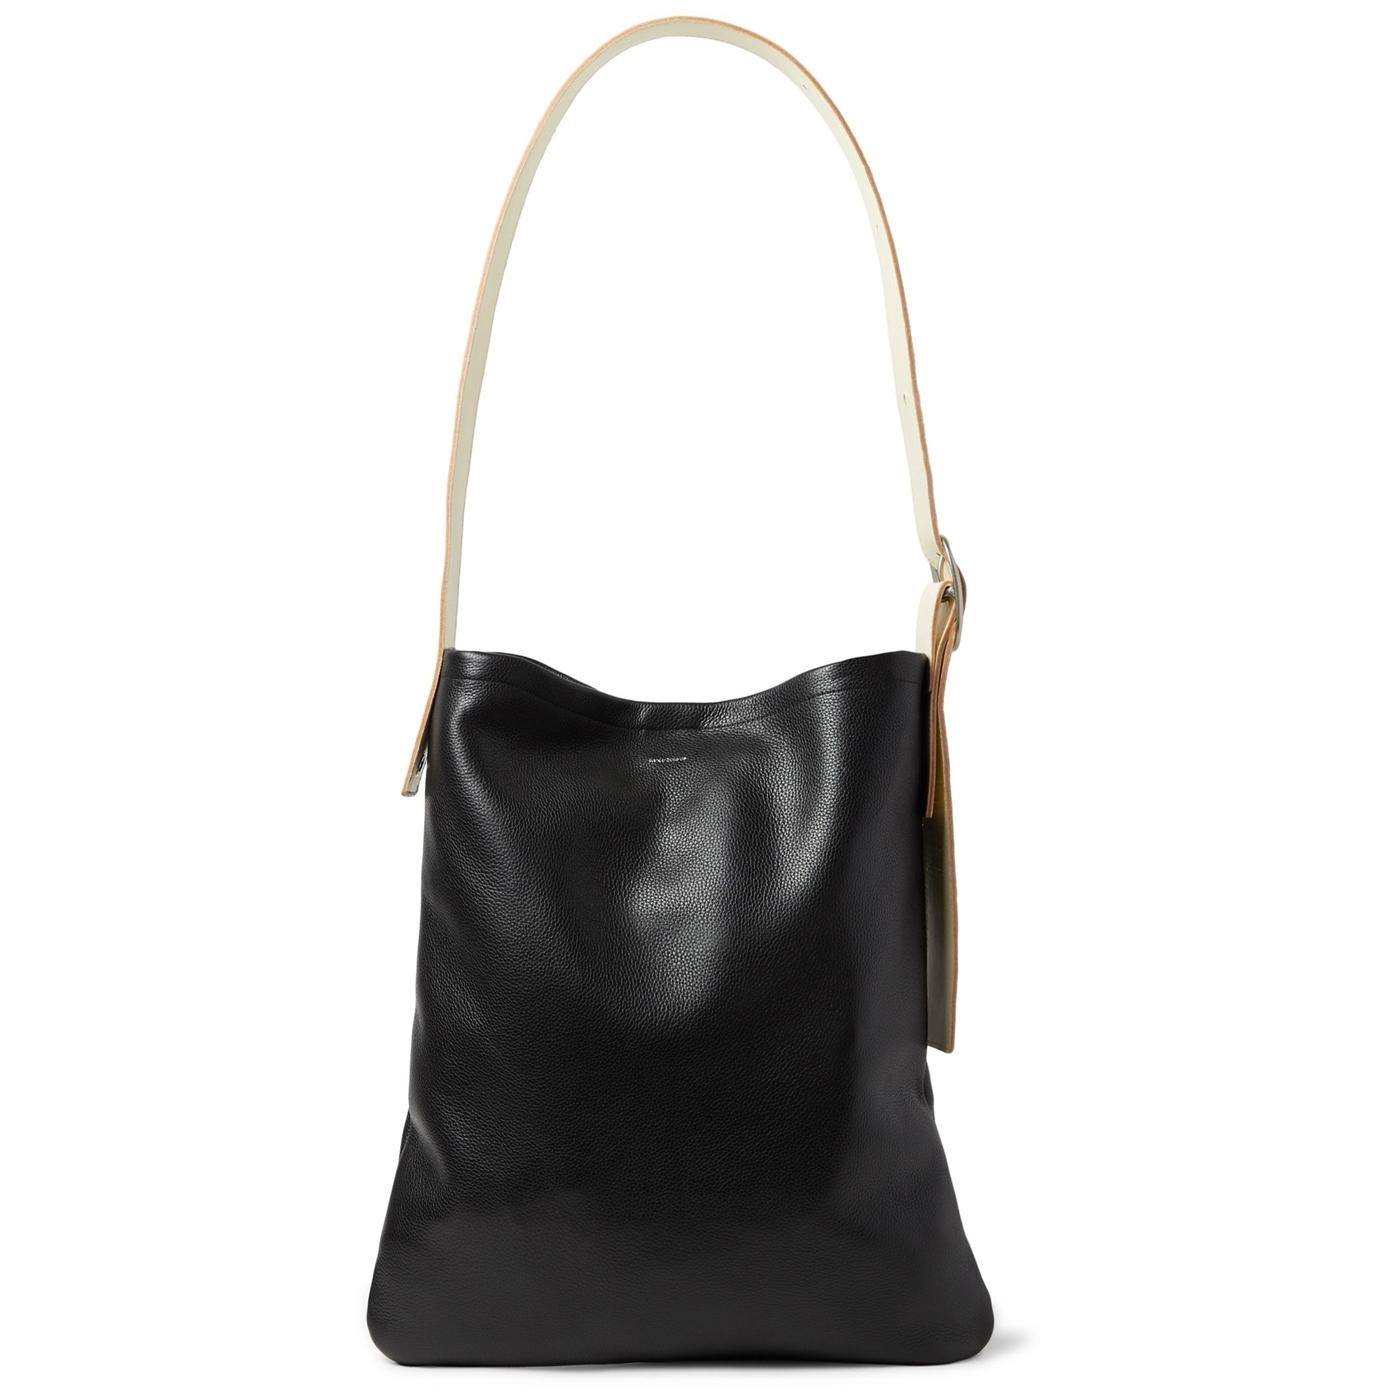 Style Mr Porter Sac Tote Bag Hender Scheme Cuir Noir